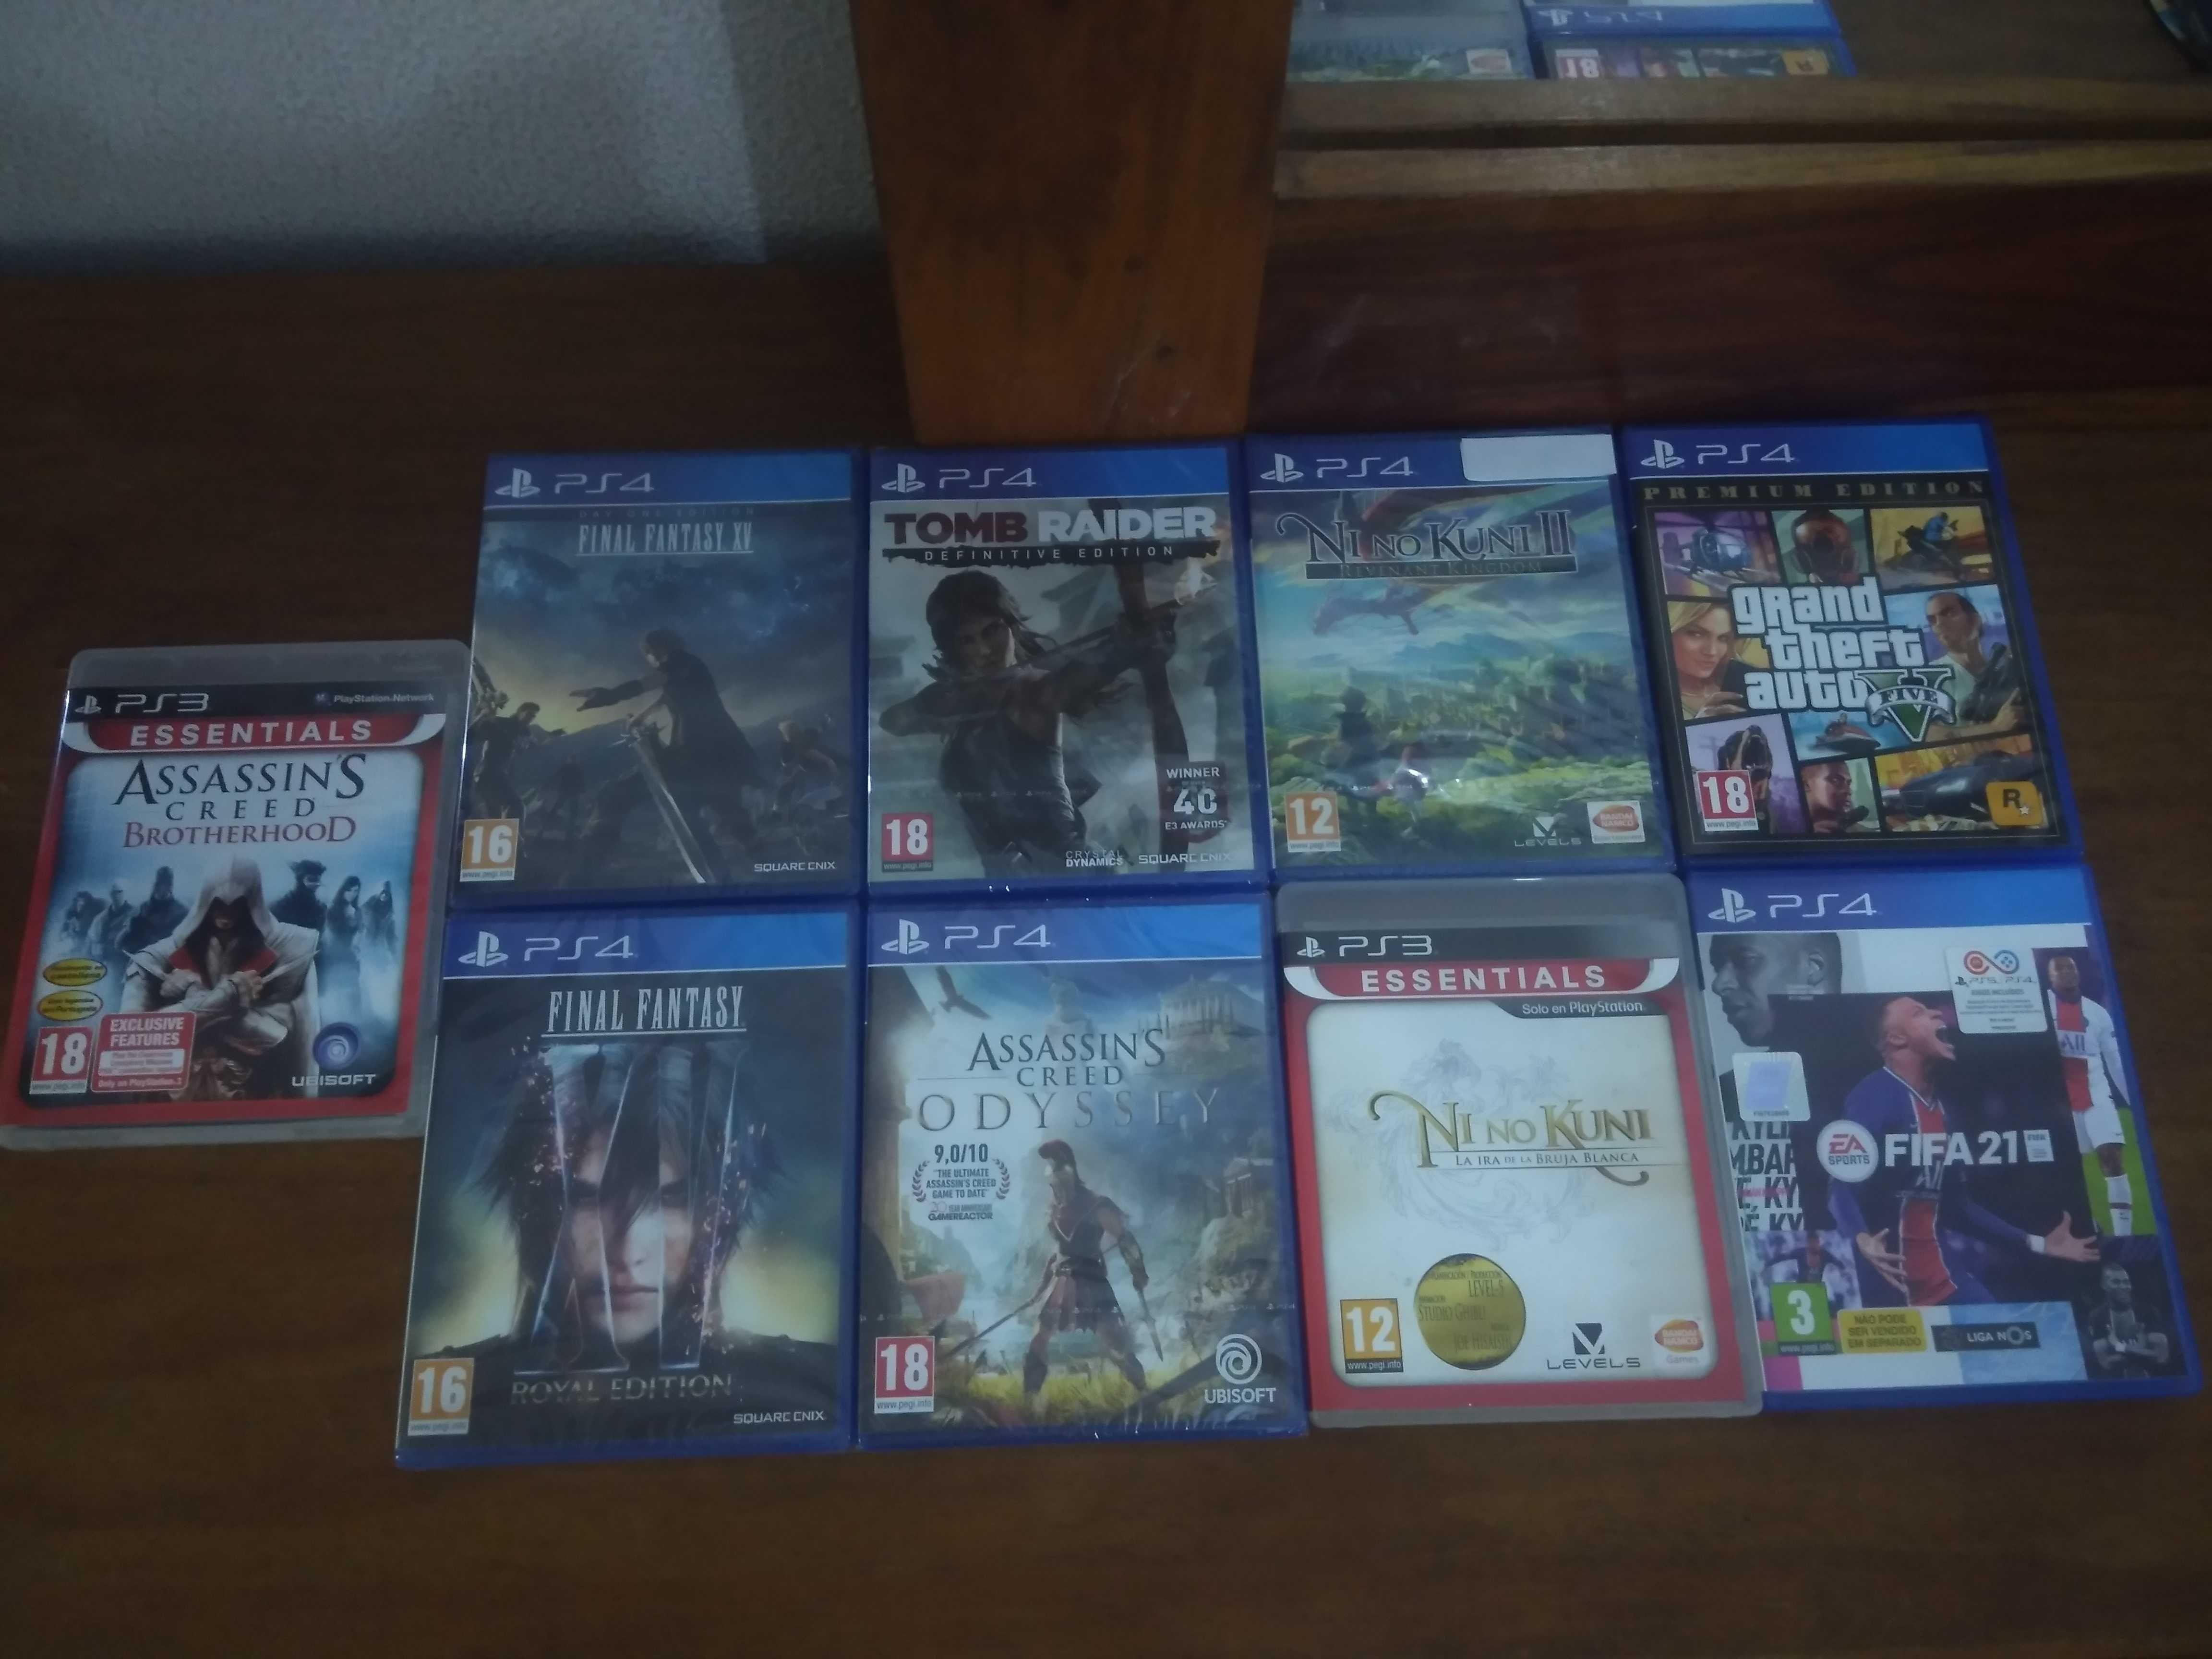 Jogo FIFA 21, GTA V premium edition, Ni no kuni, Assassin's Creed PS4